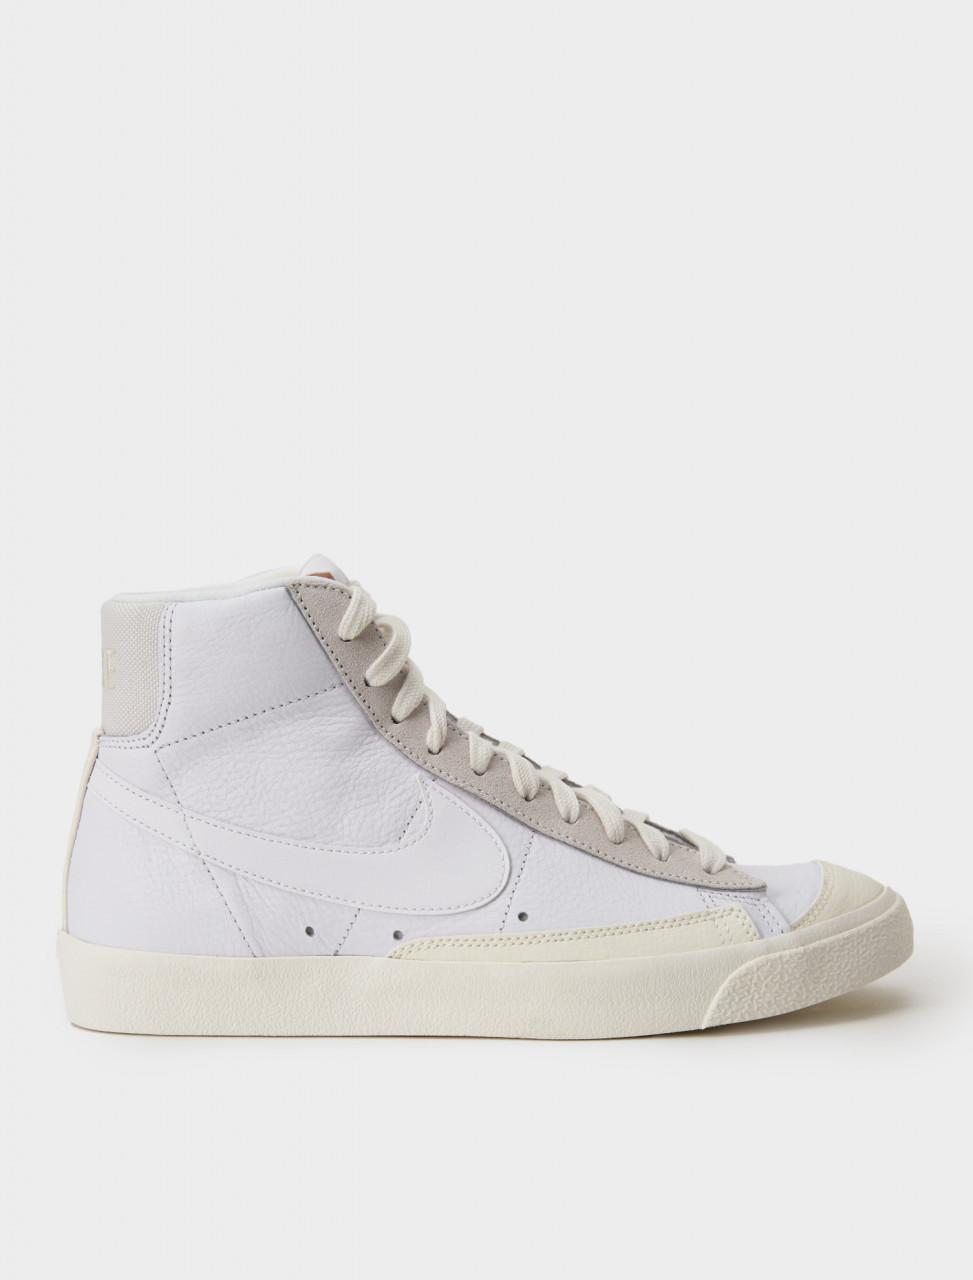 Nike Blazer Mid Vintage '77 Sneaker in White & Platinum Tint